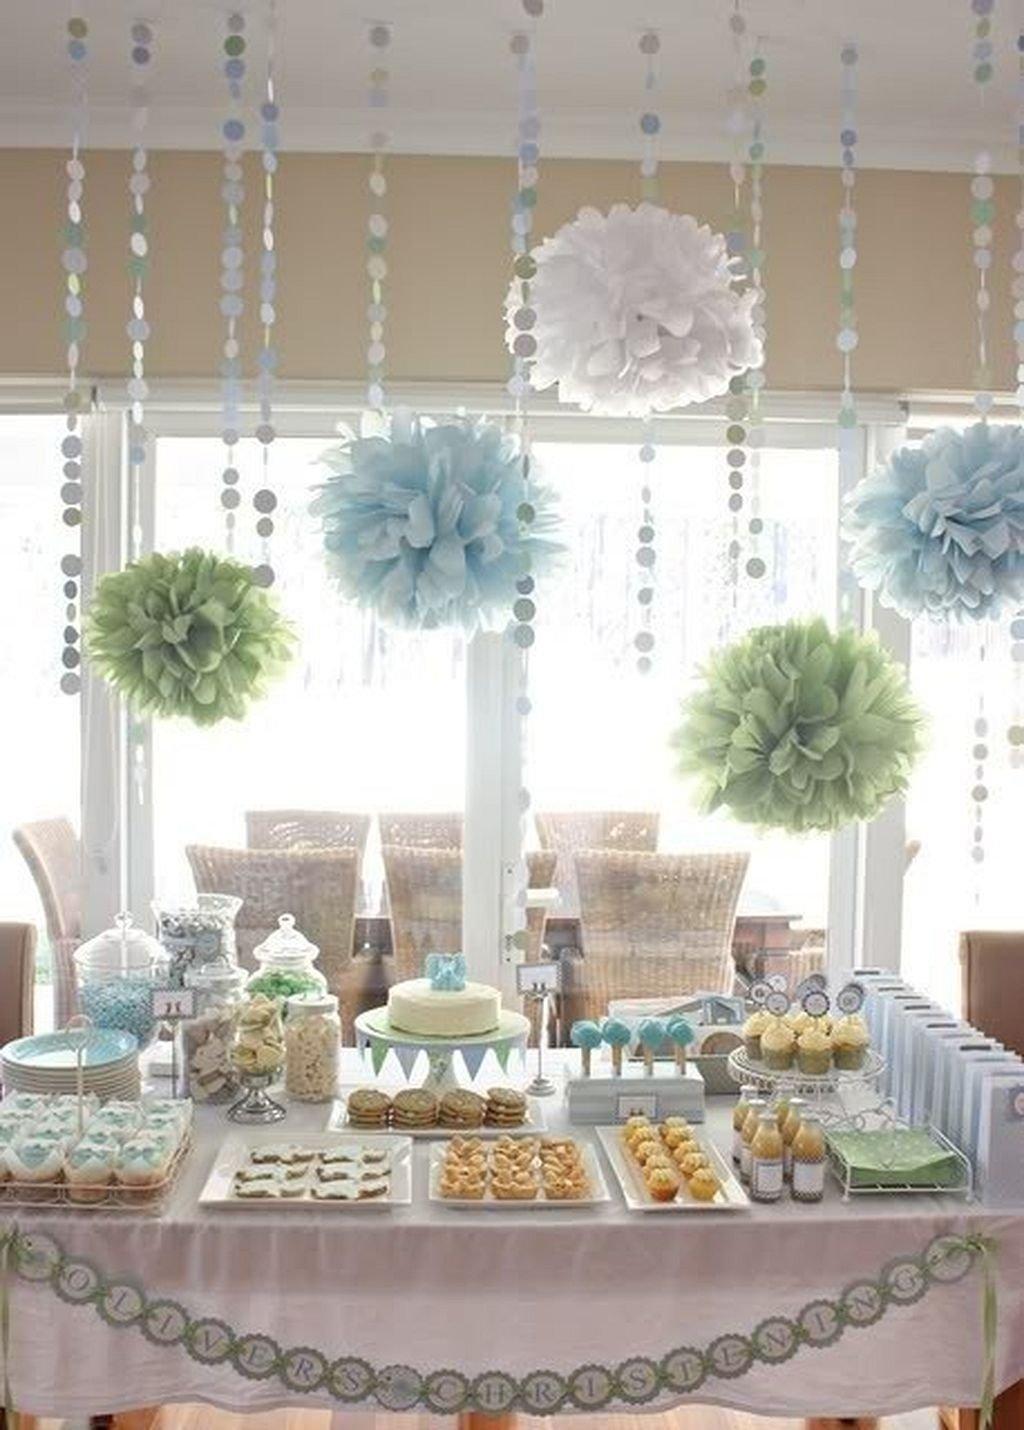 10 Stunning Decorating Ideas For Bridal Shower 20 bridal shower ideas bridal showers bridal showers and weddings 2020